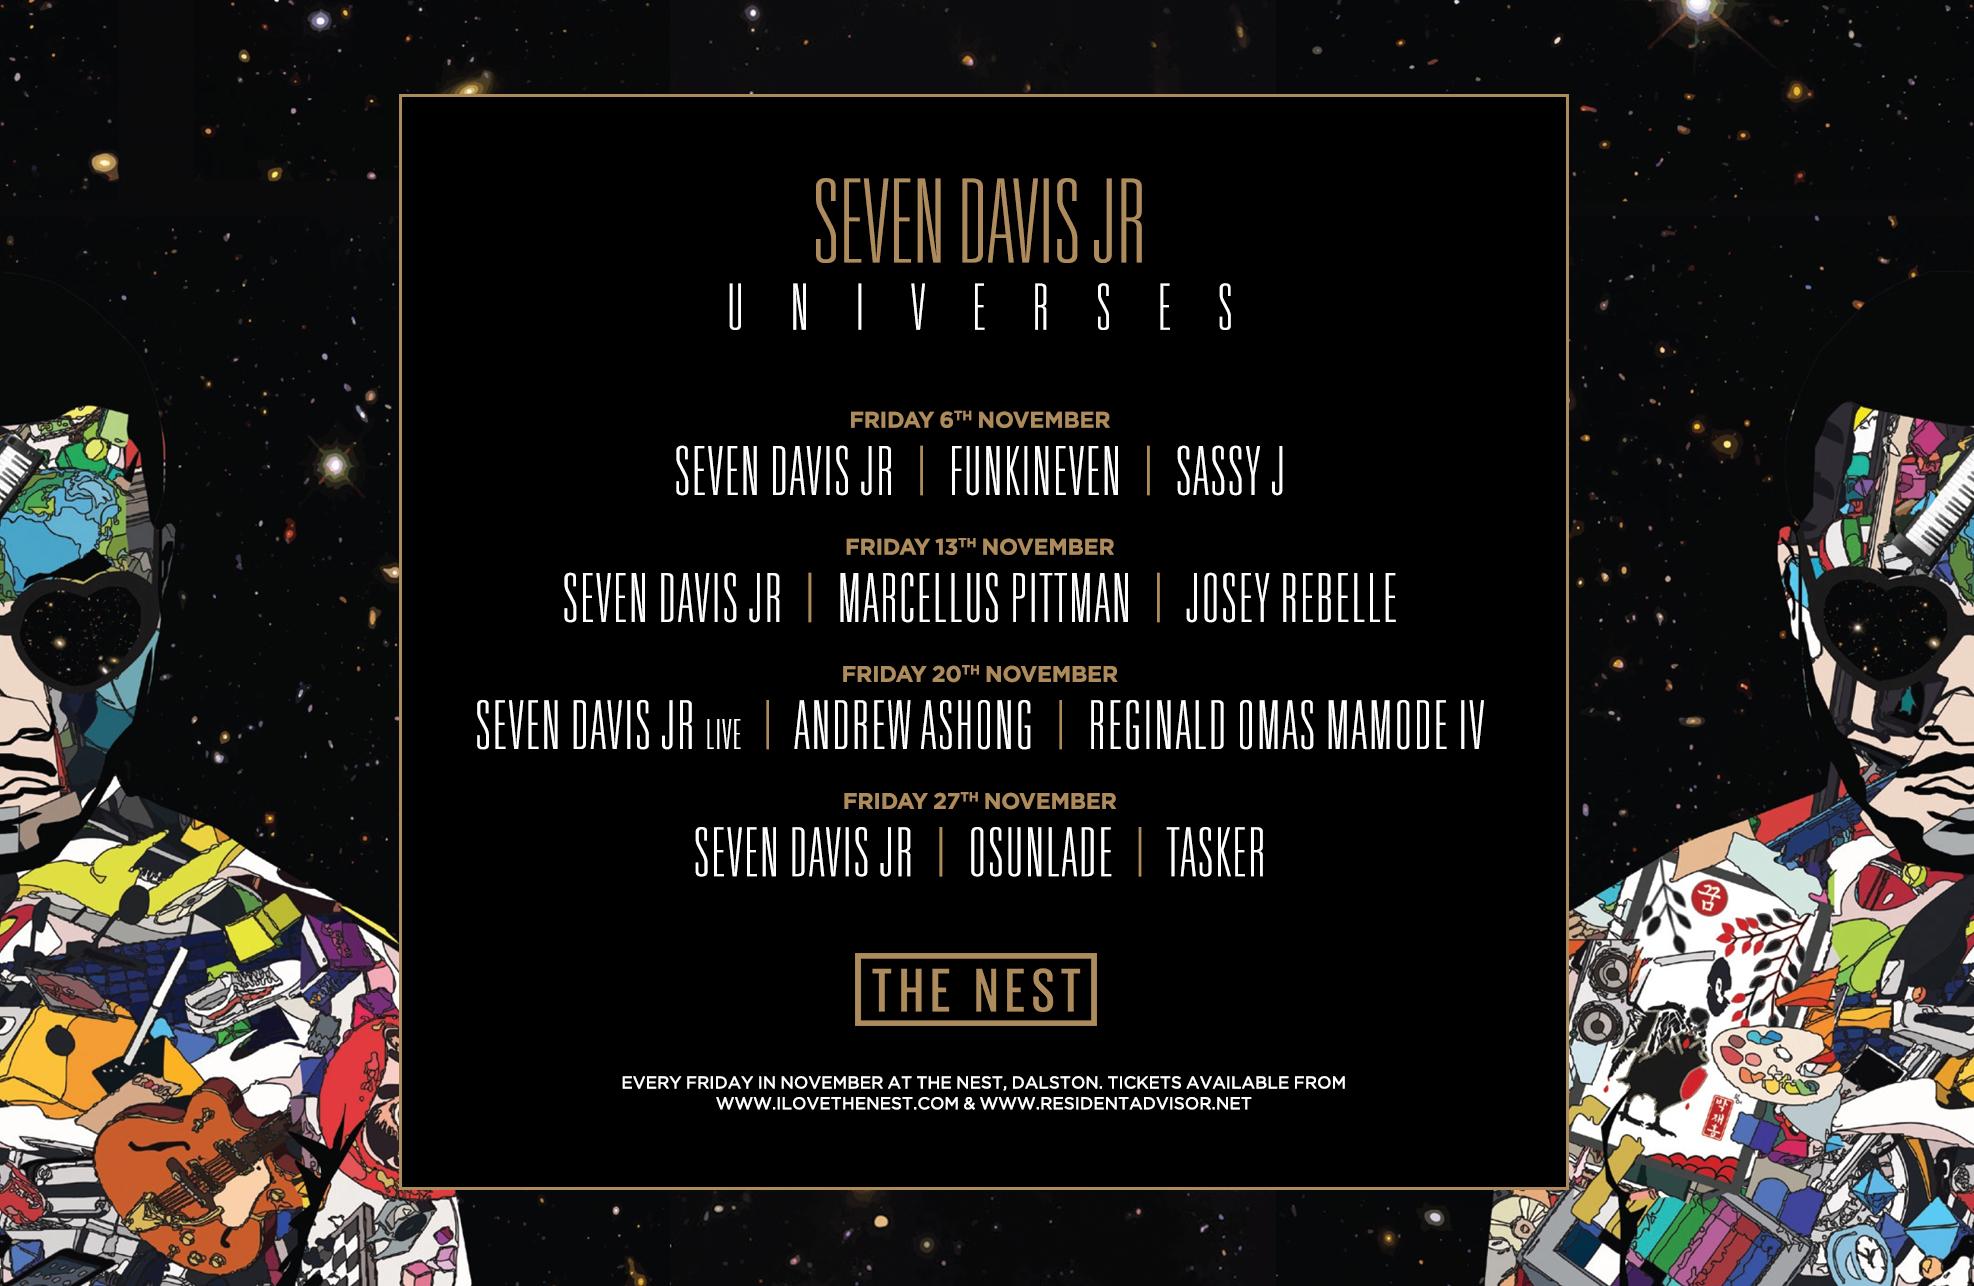 sevendavis-announcement-Final